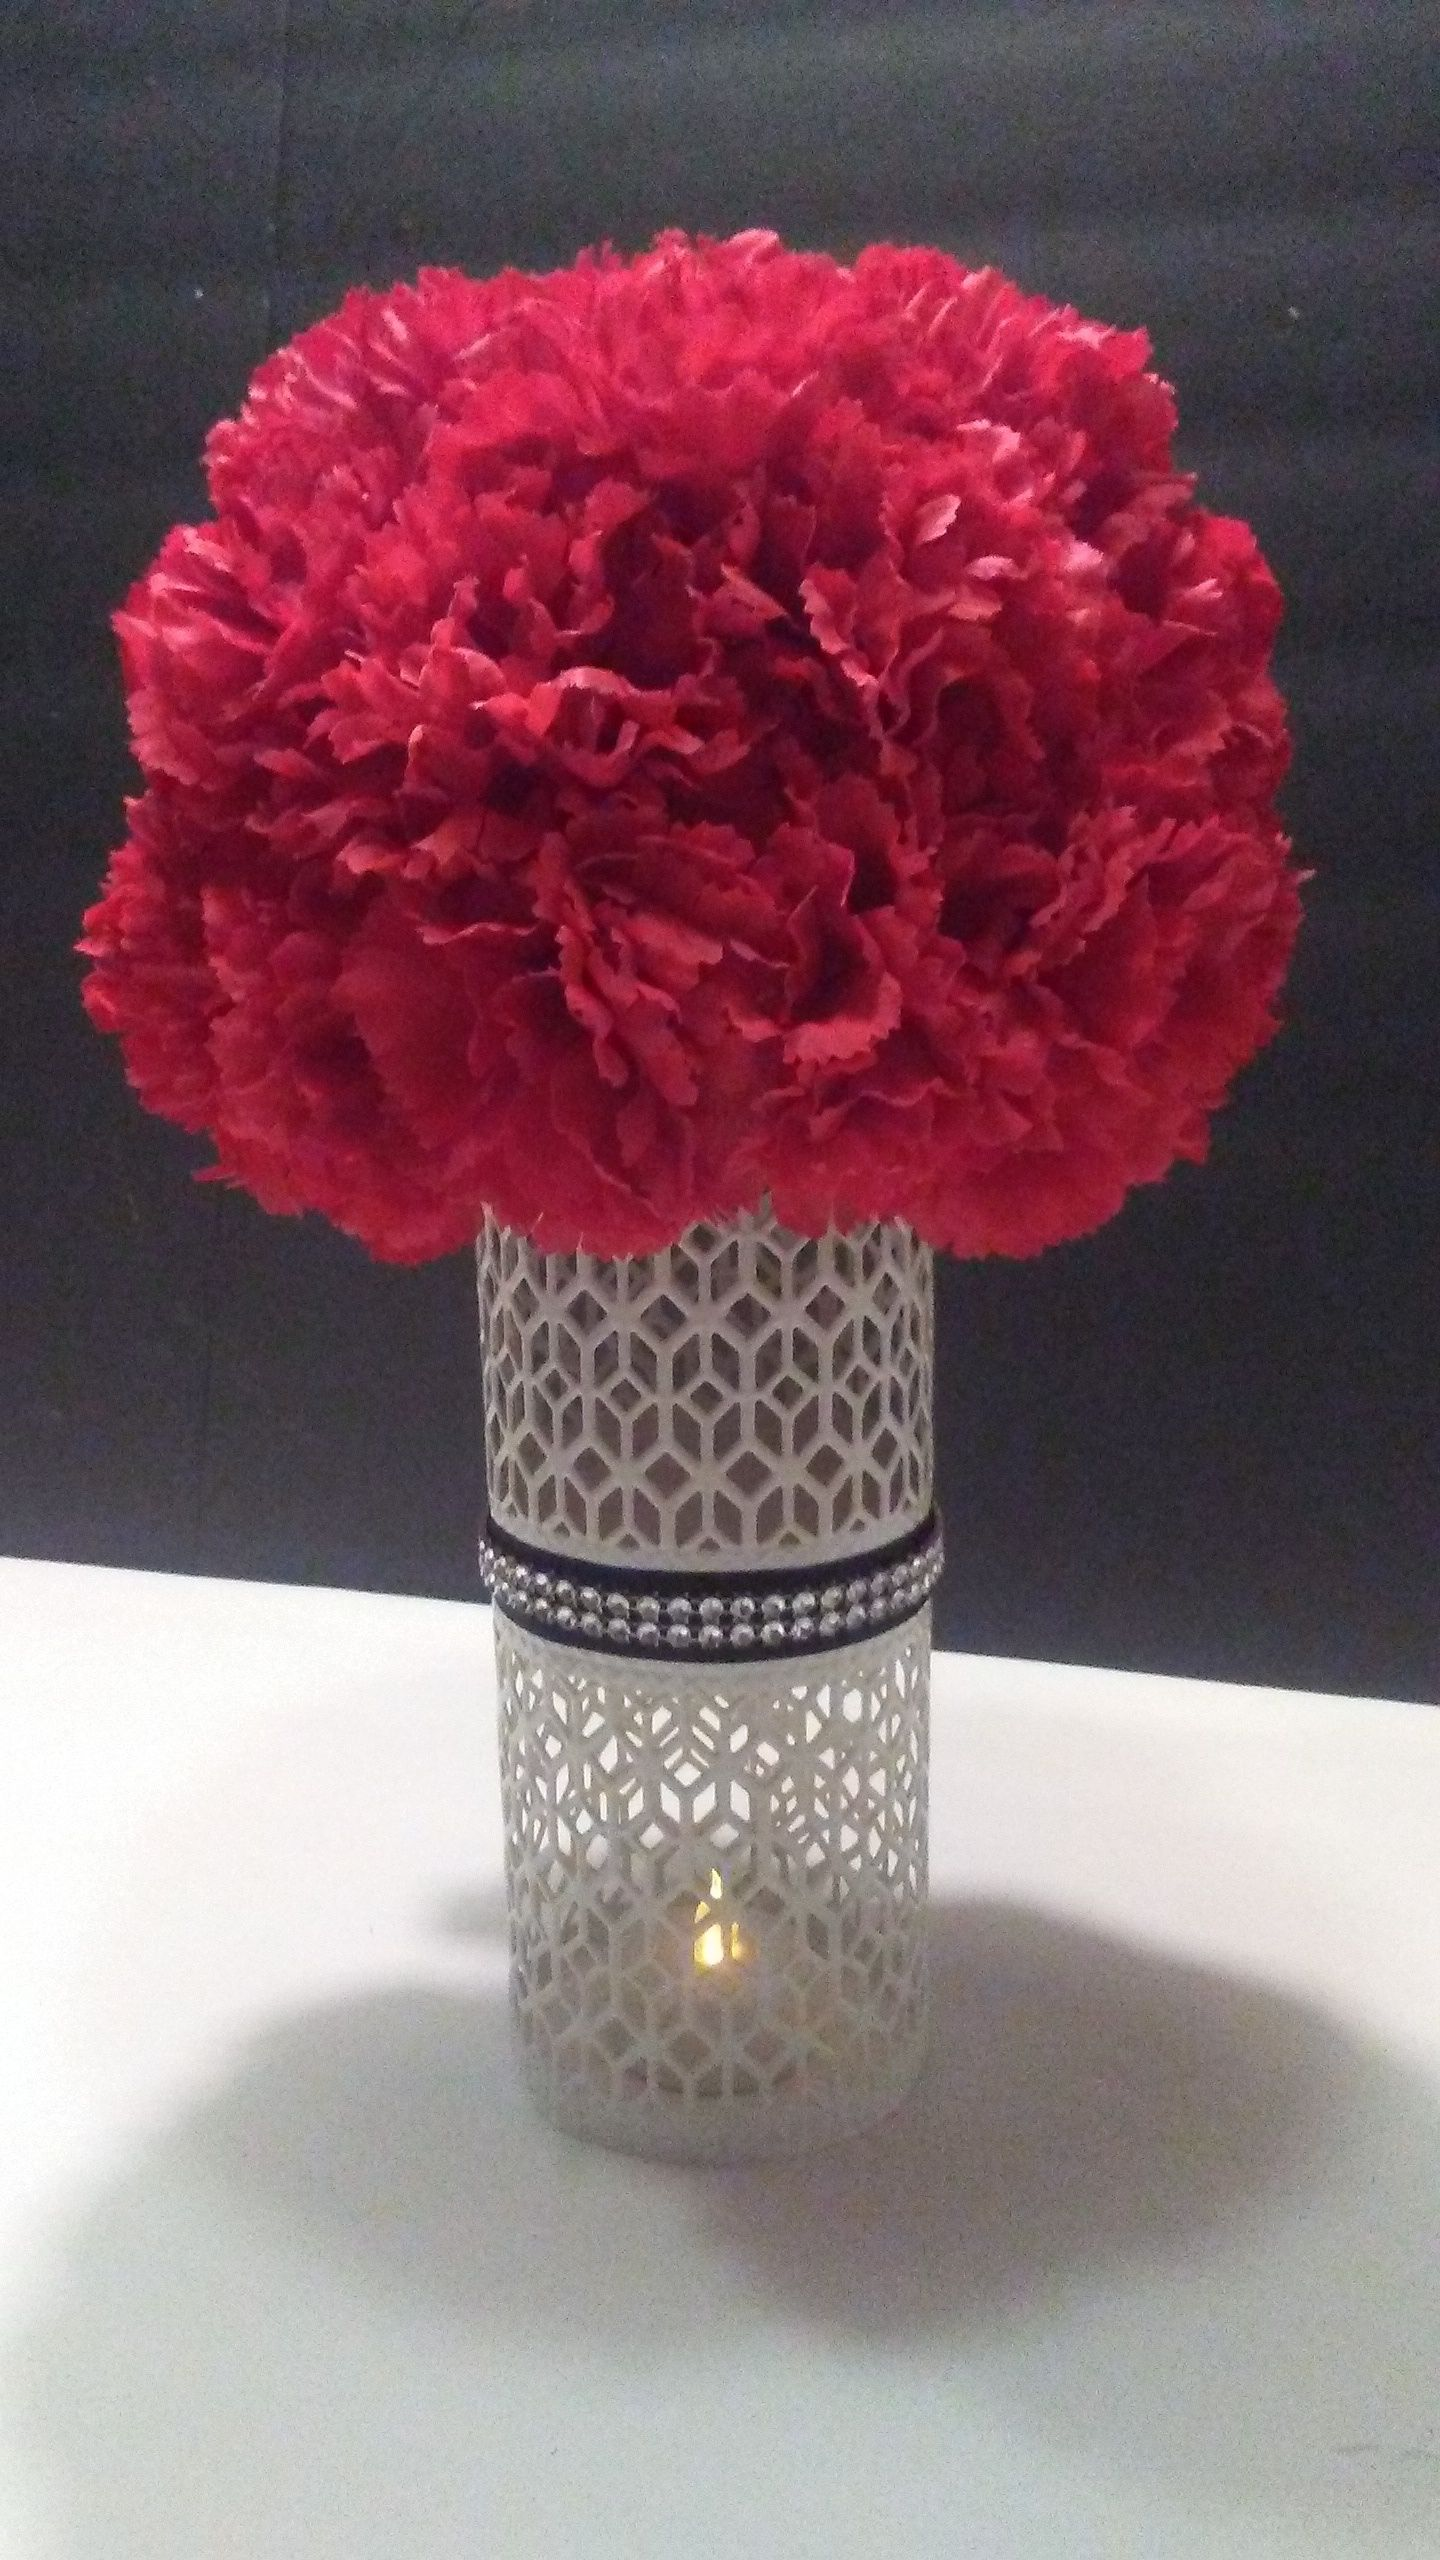 40 beautiful creative diy flower arrangement ideas 40 beautiful creative diy flower arrangement ideas reviewsmspy